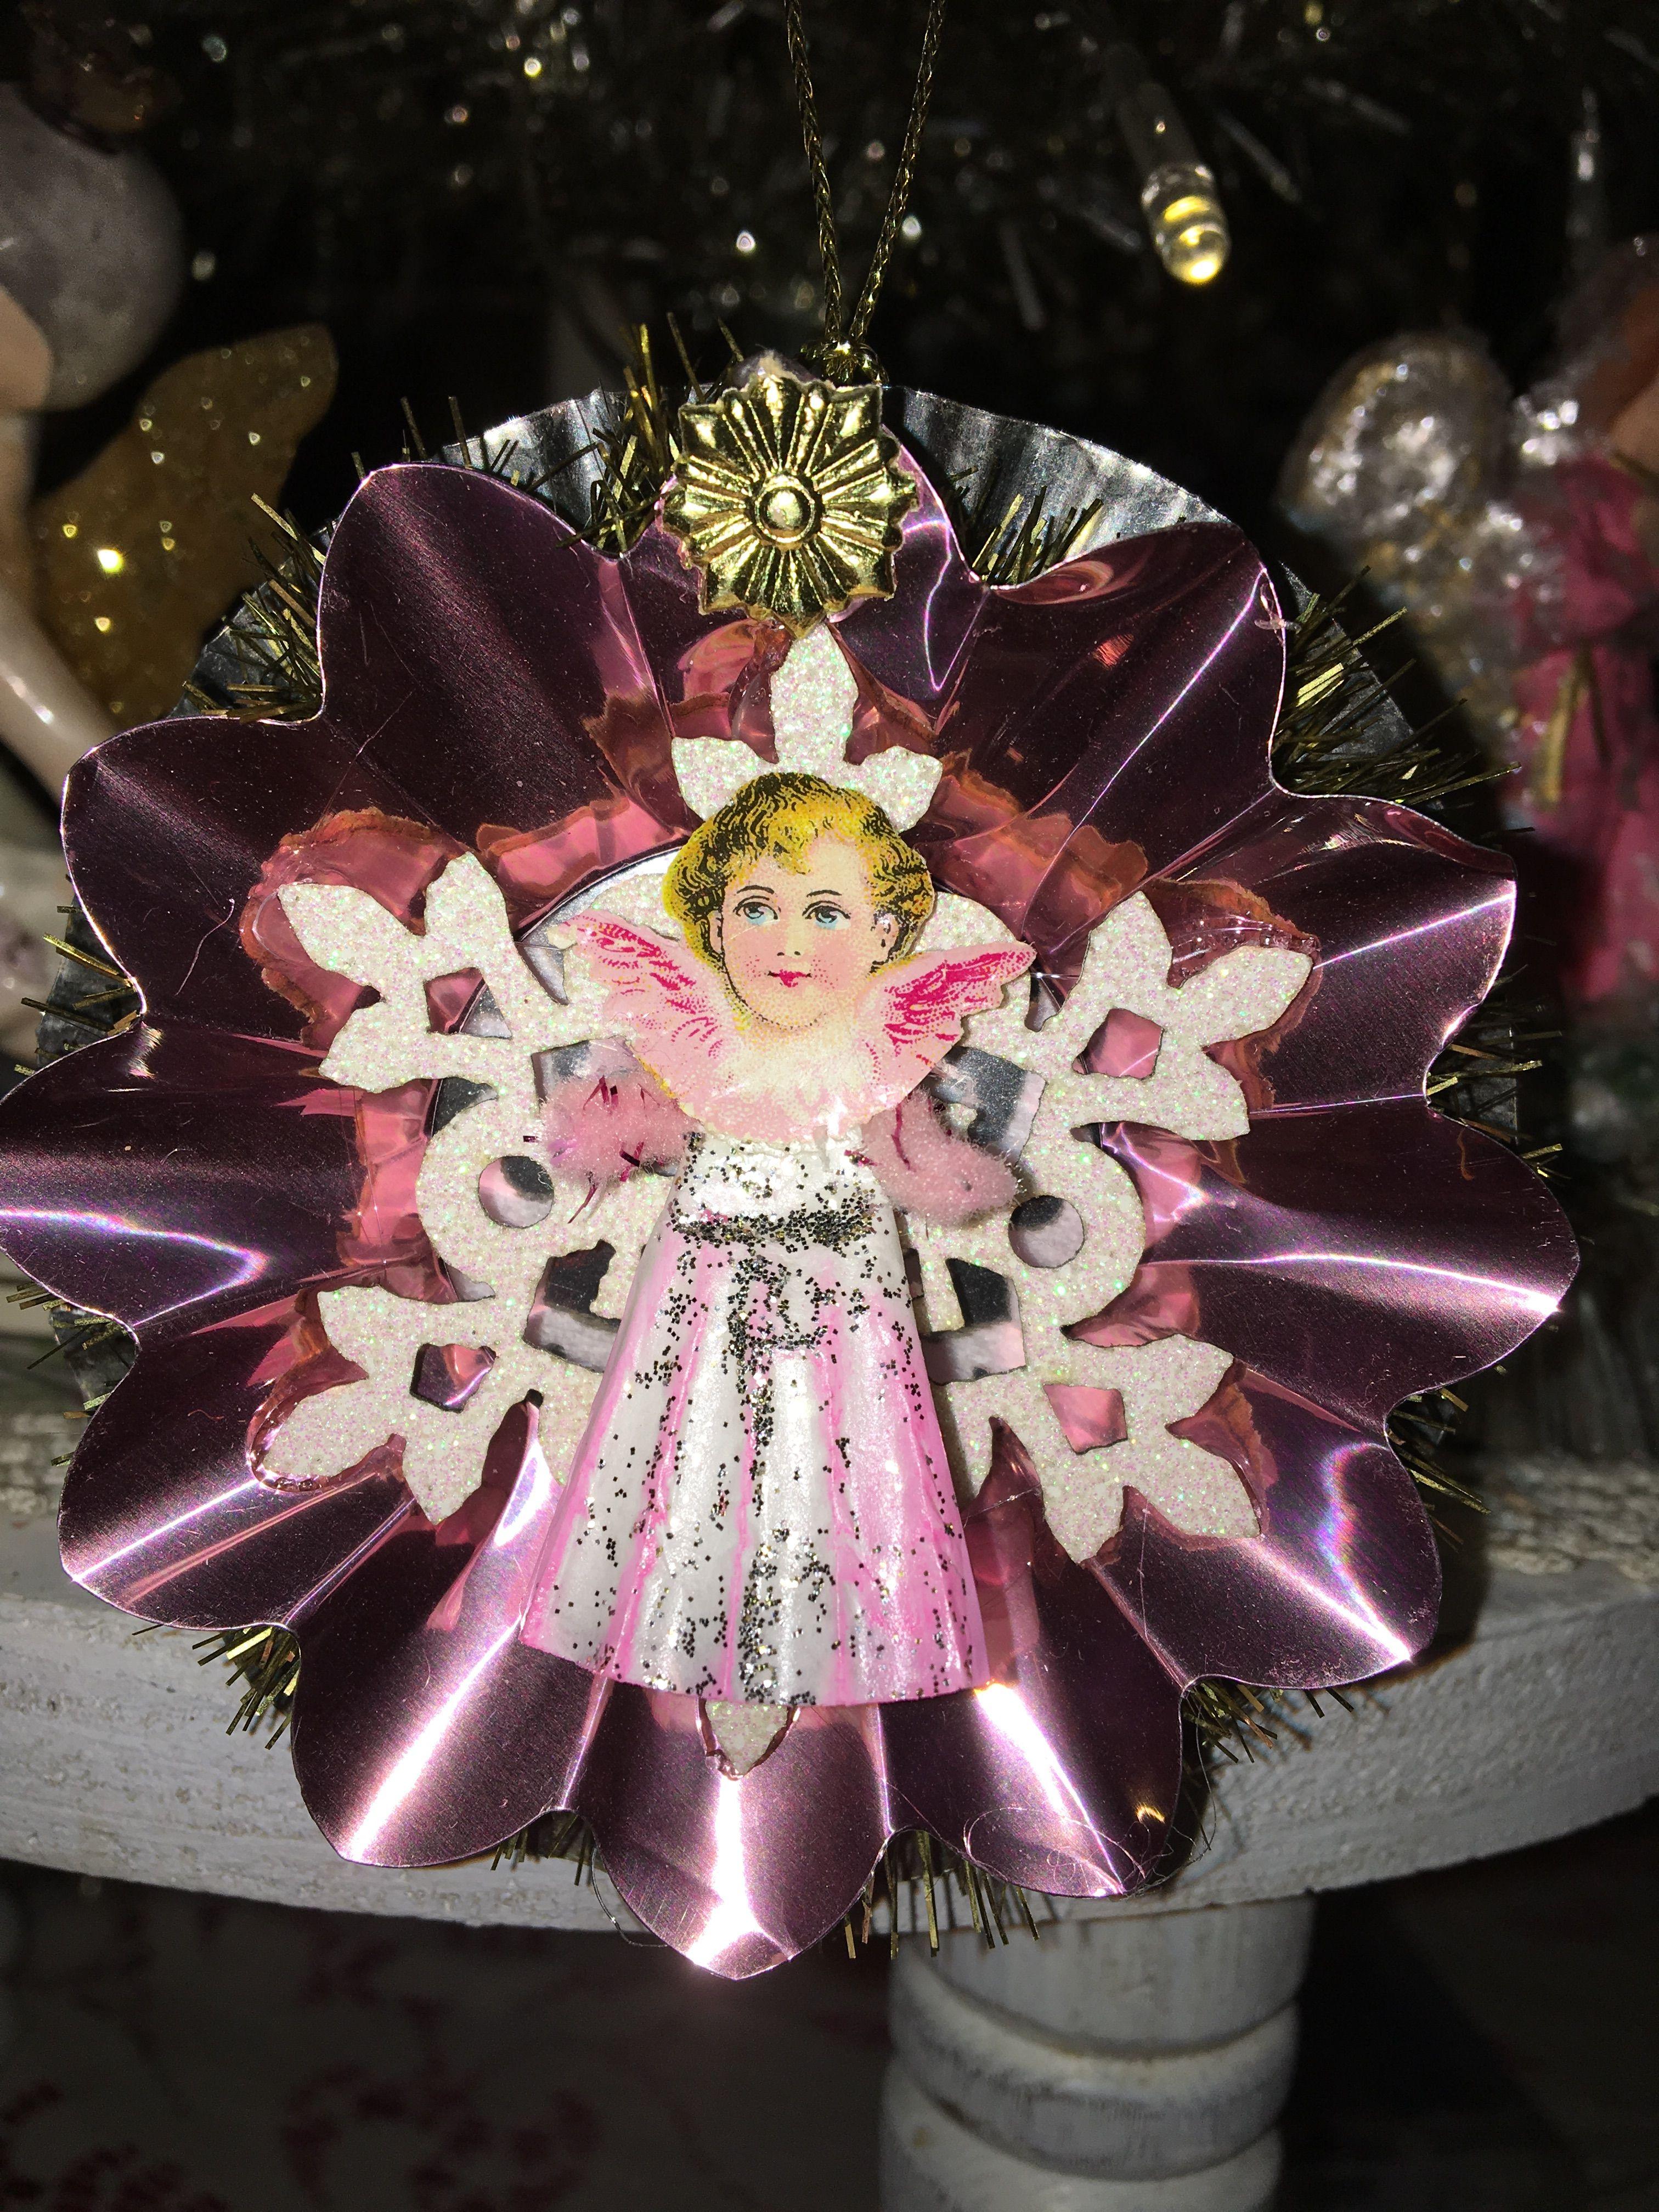 Handmade German Scrap Angel reflector Ornament by Jeanette Crooks